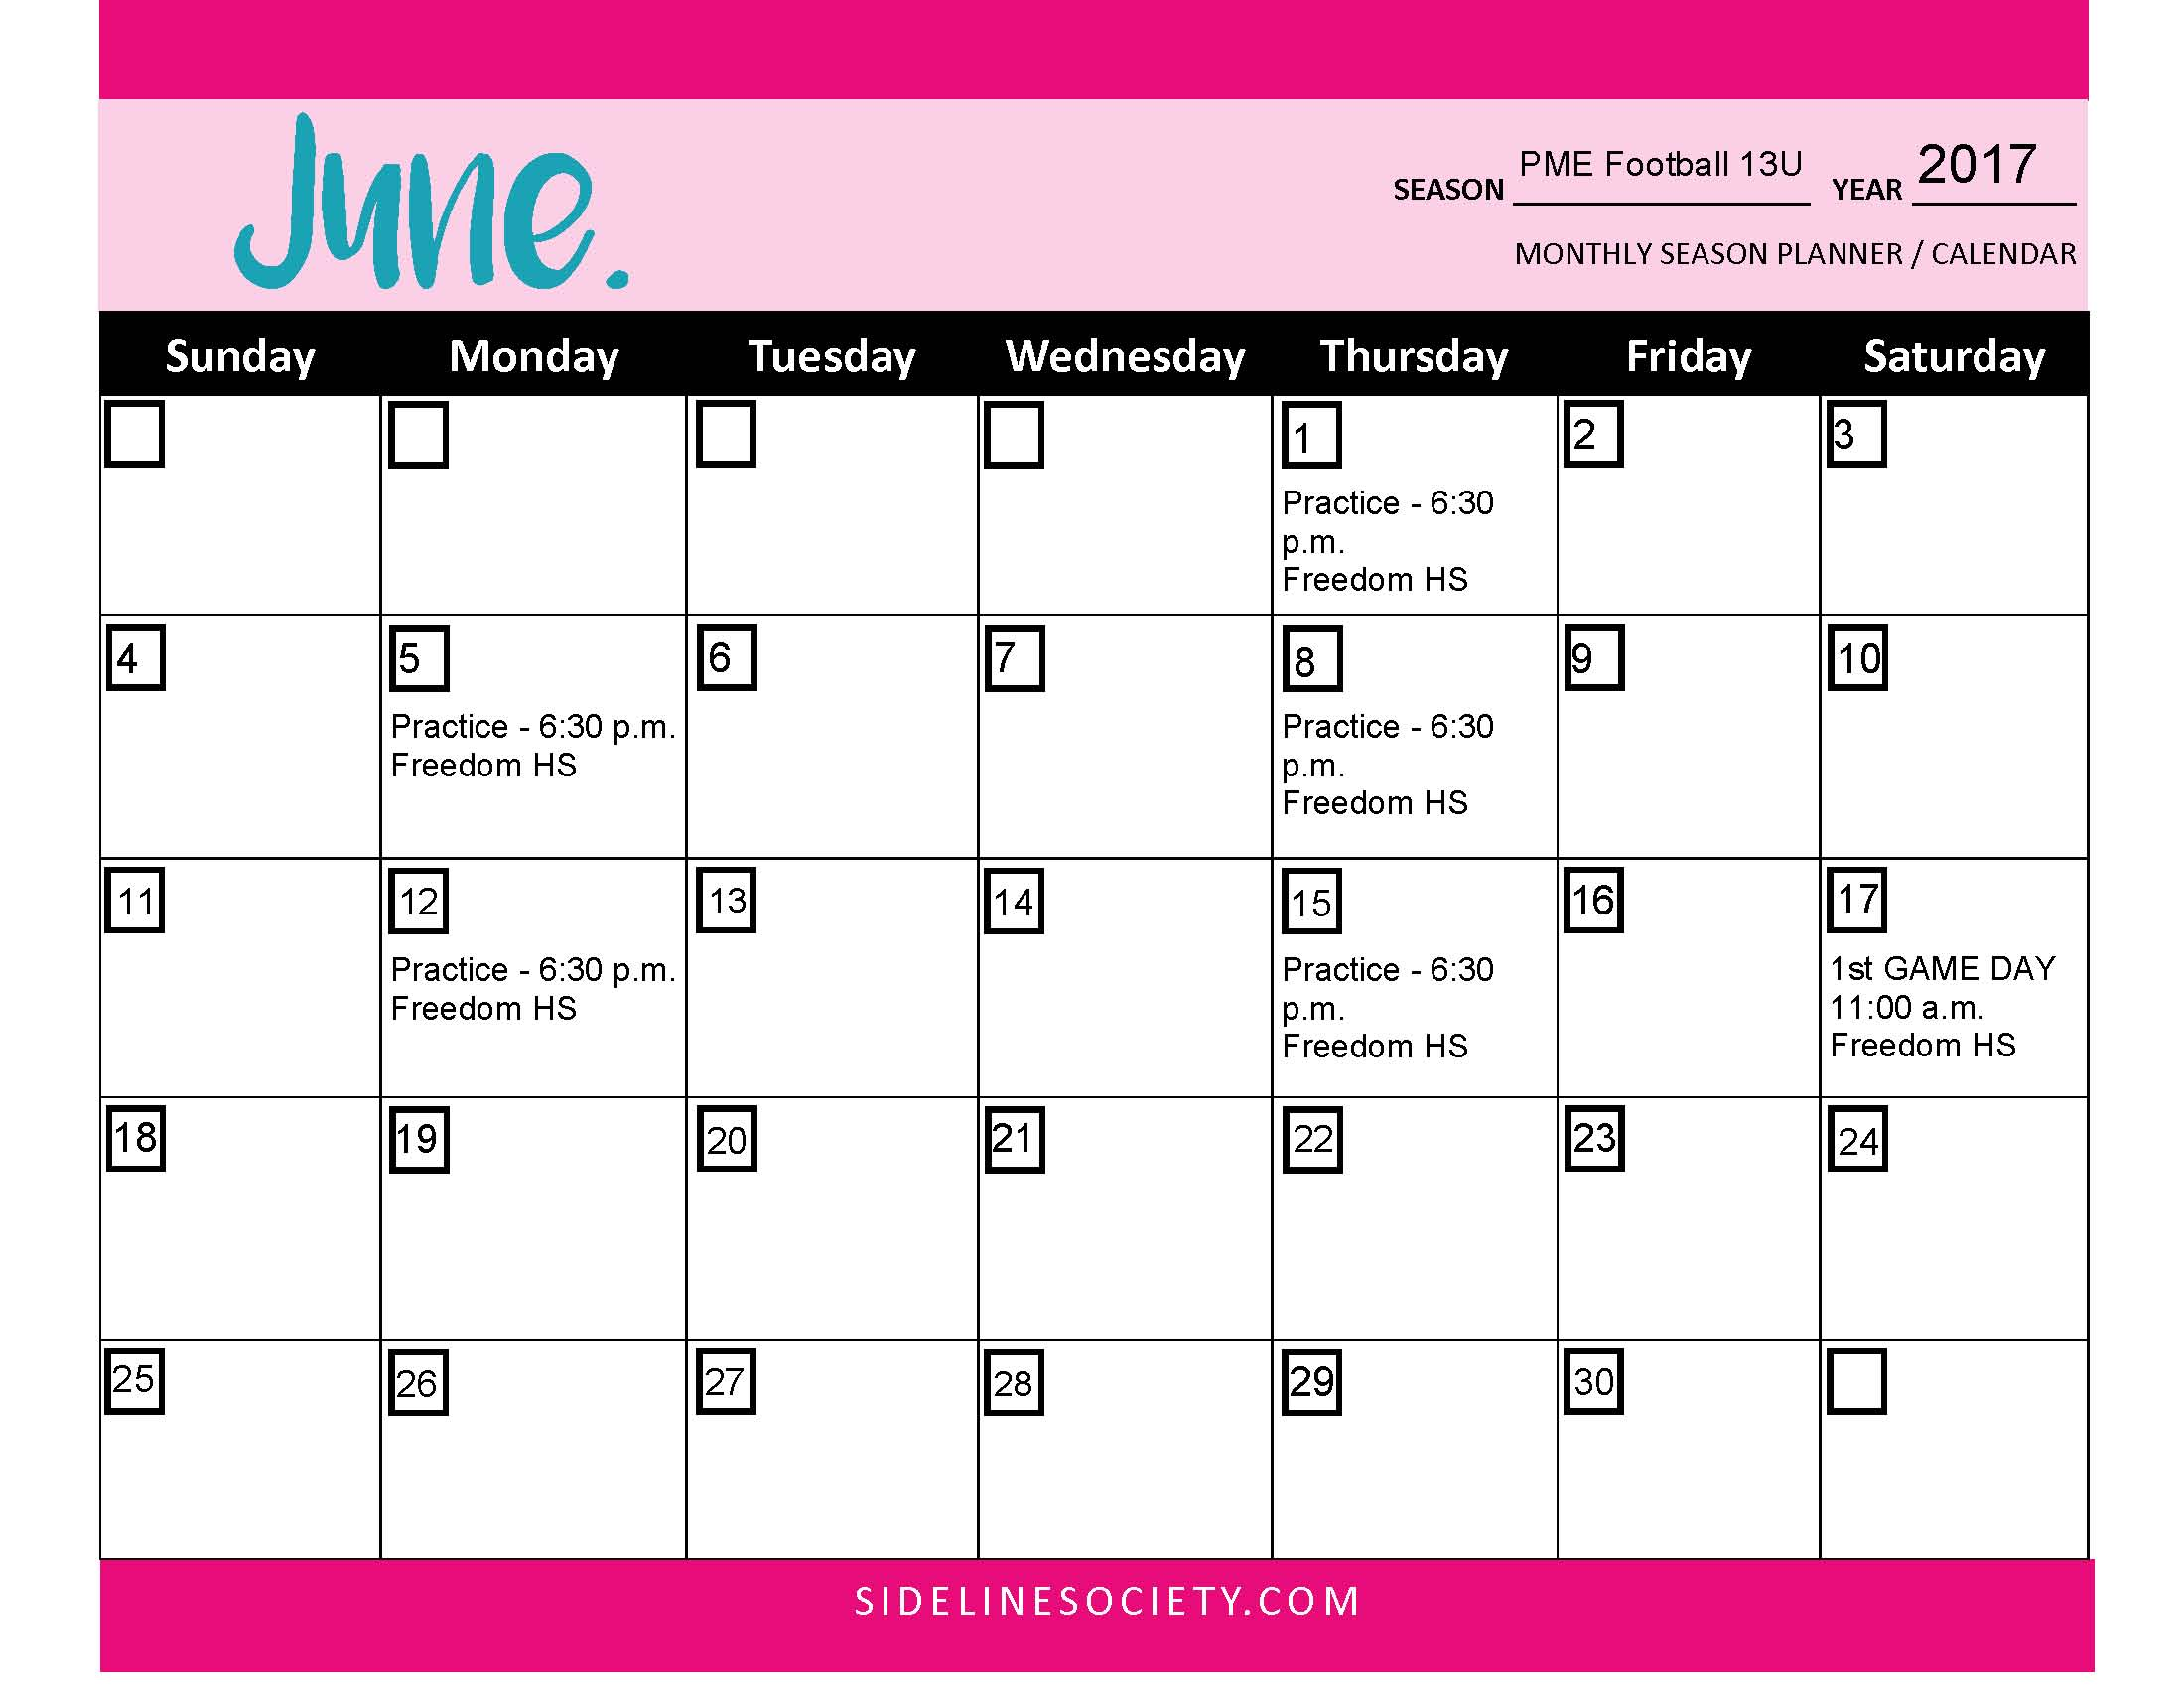 Monthly Season Planner / Calendar (Season Planning Kit)